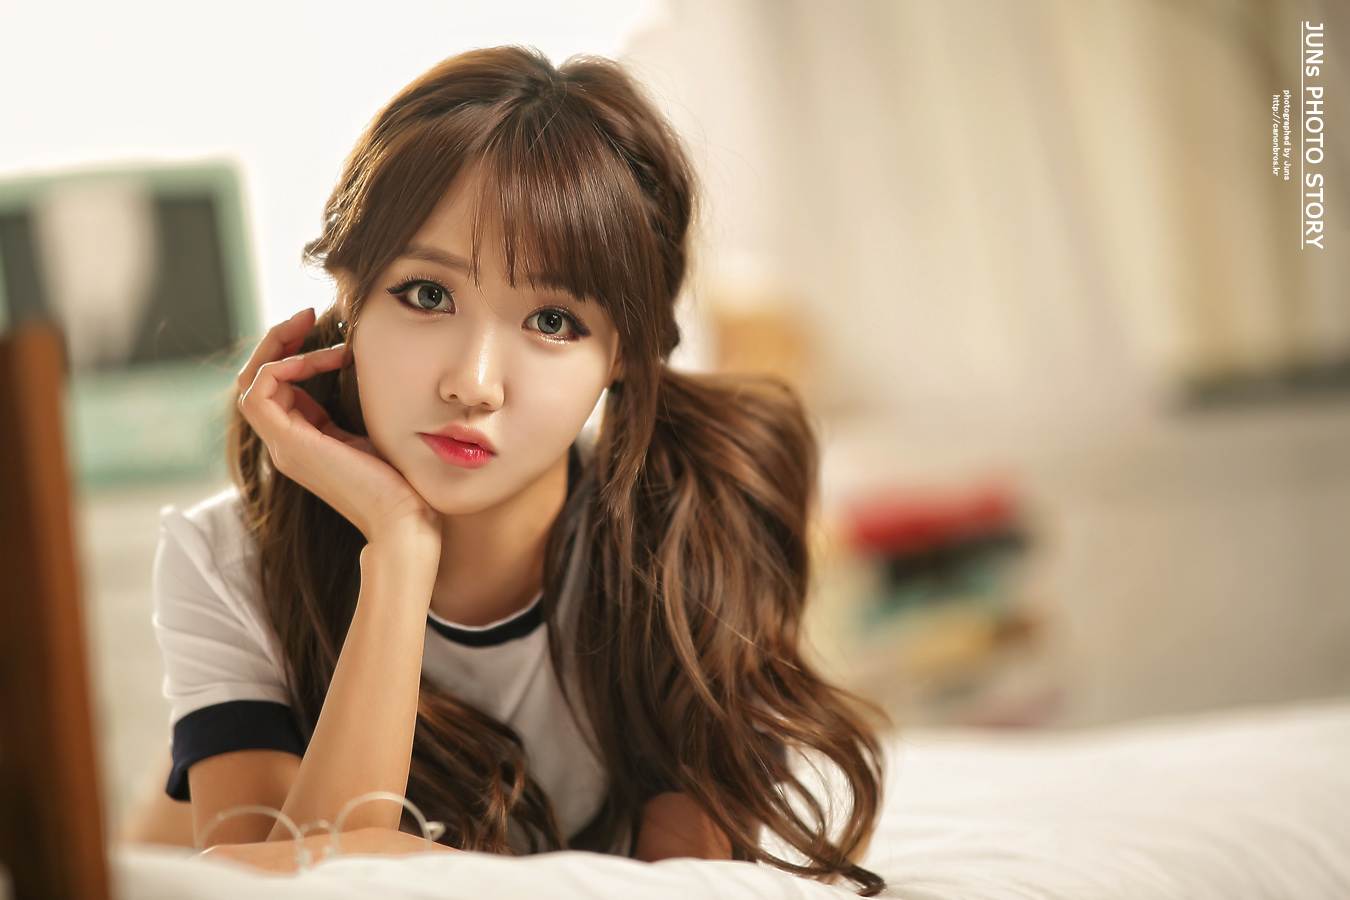 cute-korean-communist-girl-sex-hot-first-night-girl-buy